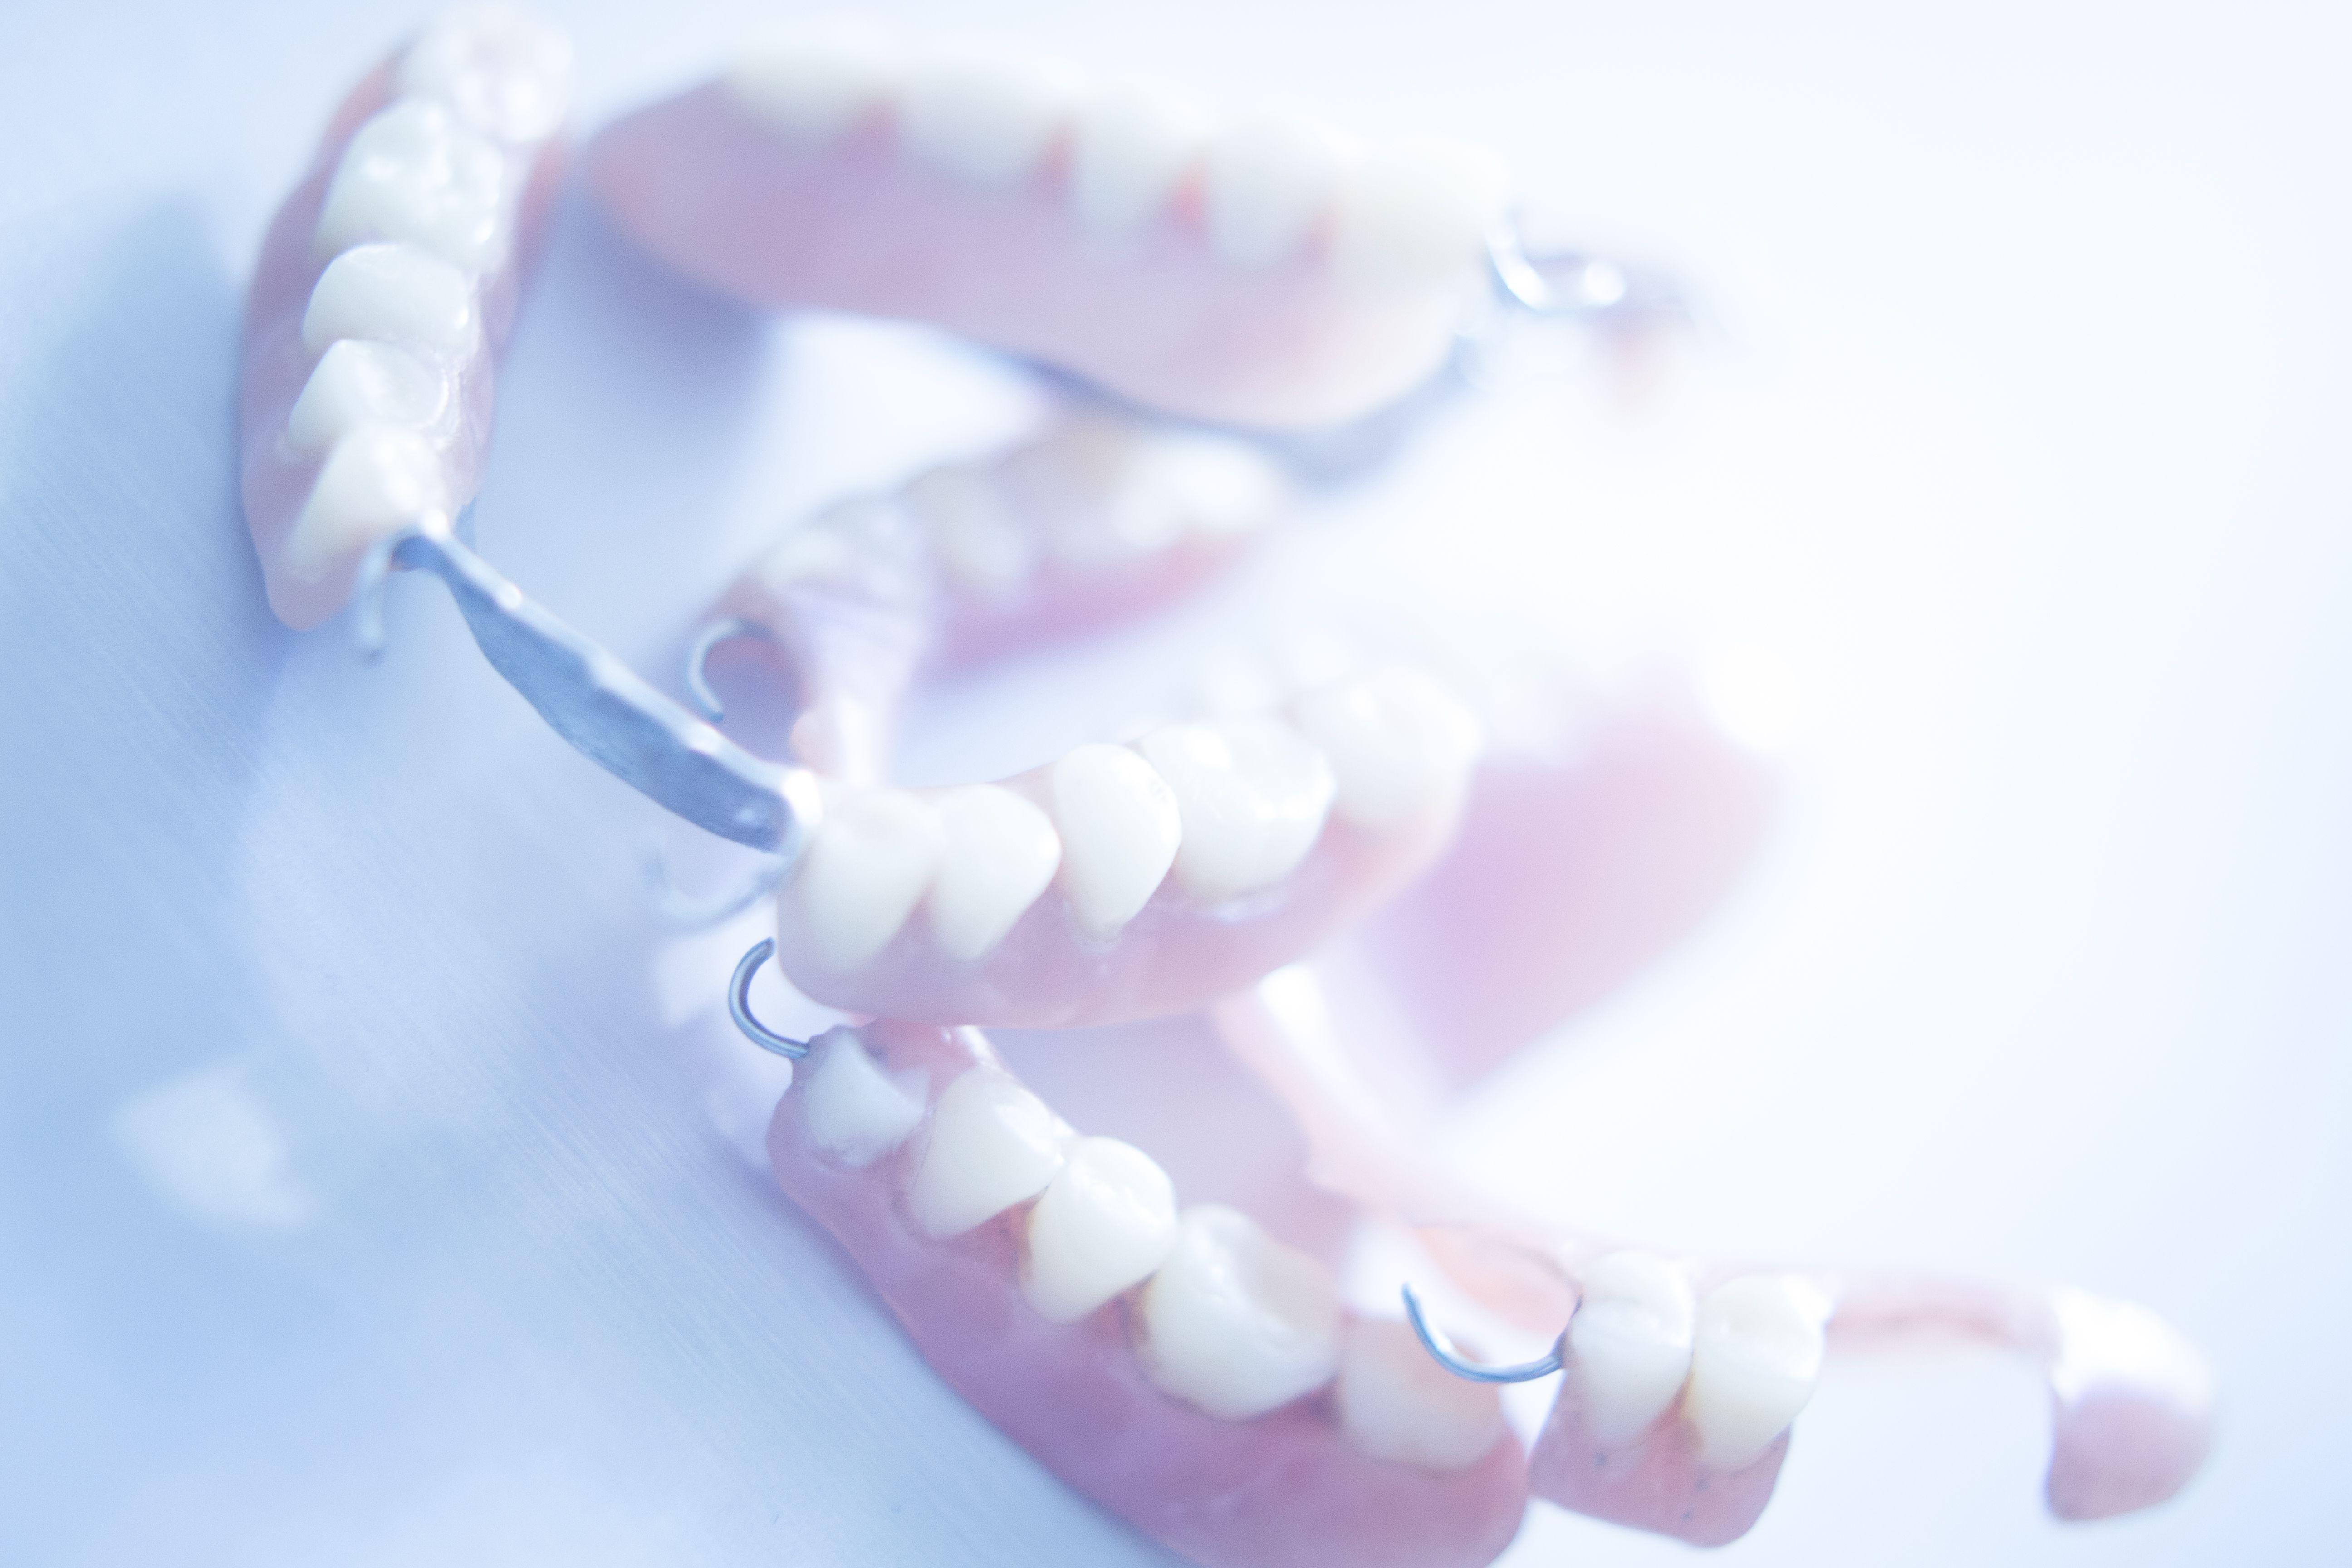 Prótesis dentales removibles: Especialidades de Clínica Dental Plaza 58 (Dr. Pedro Fernández Lorente)